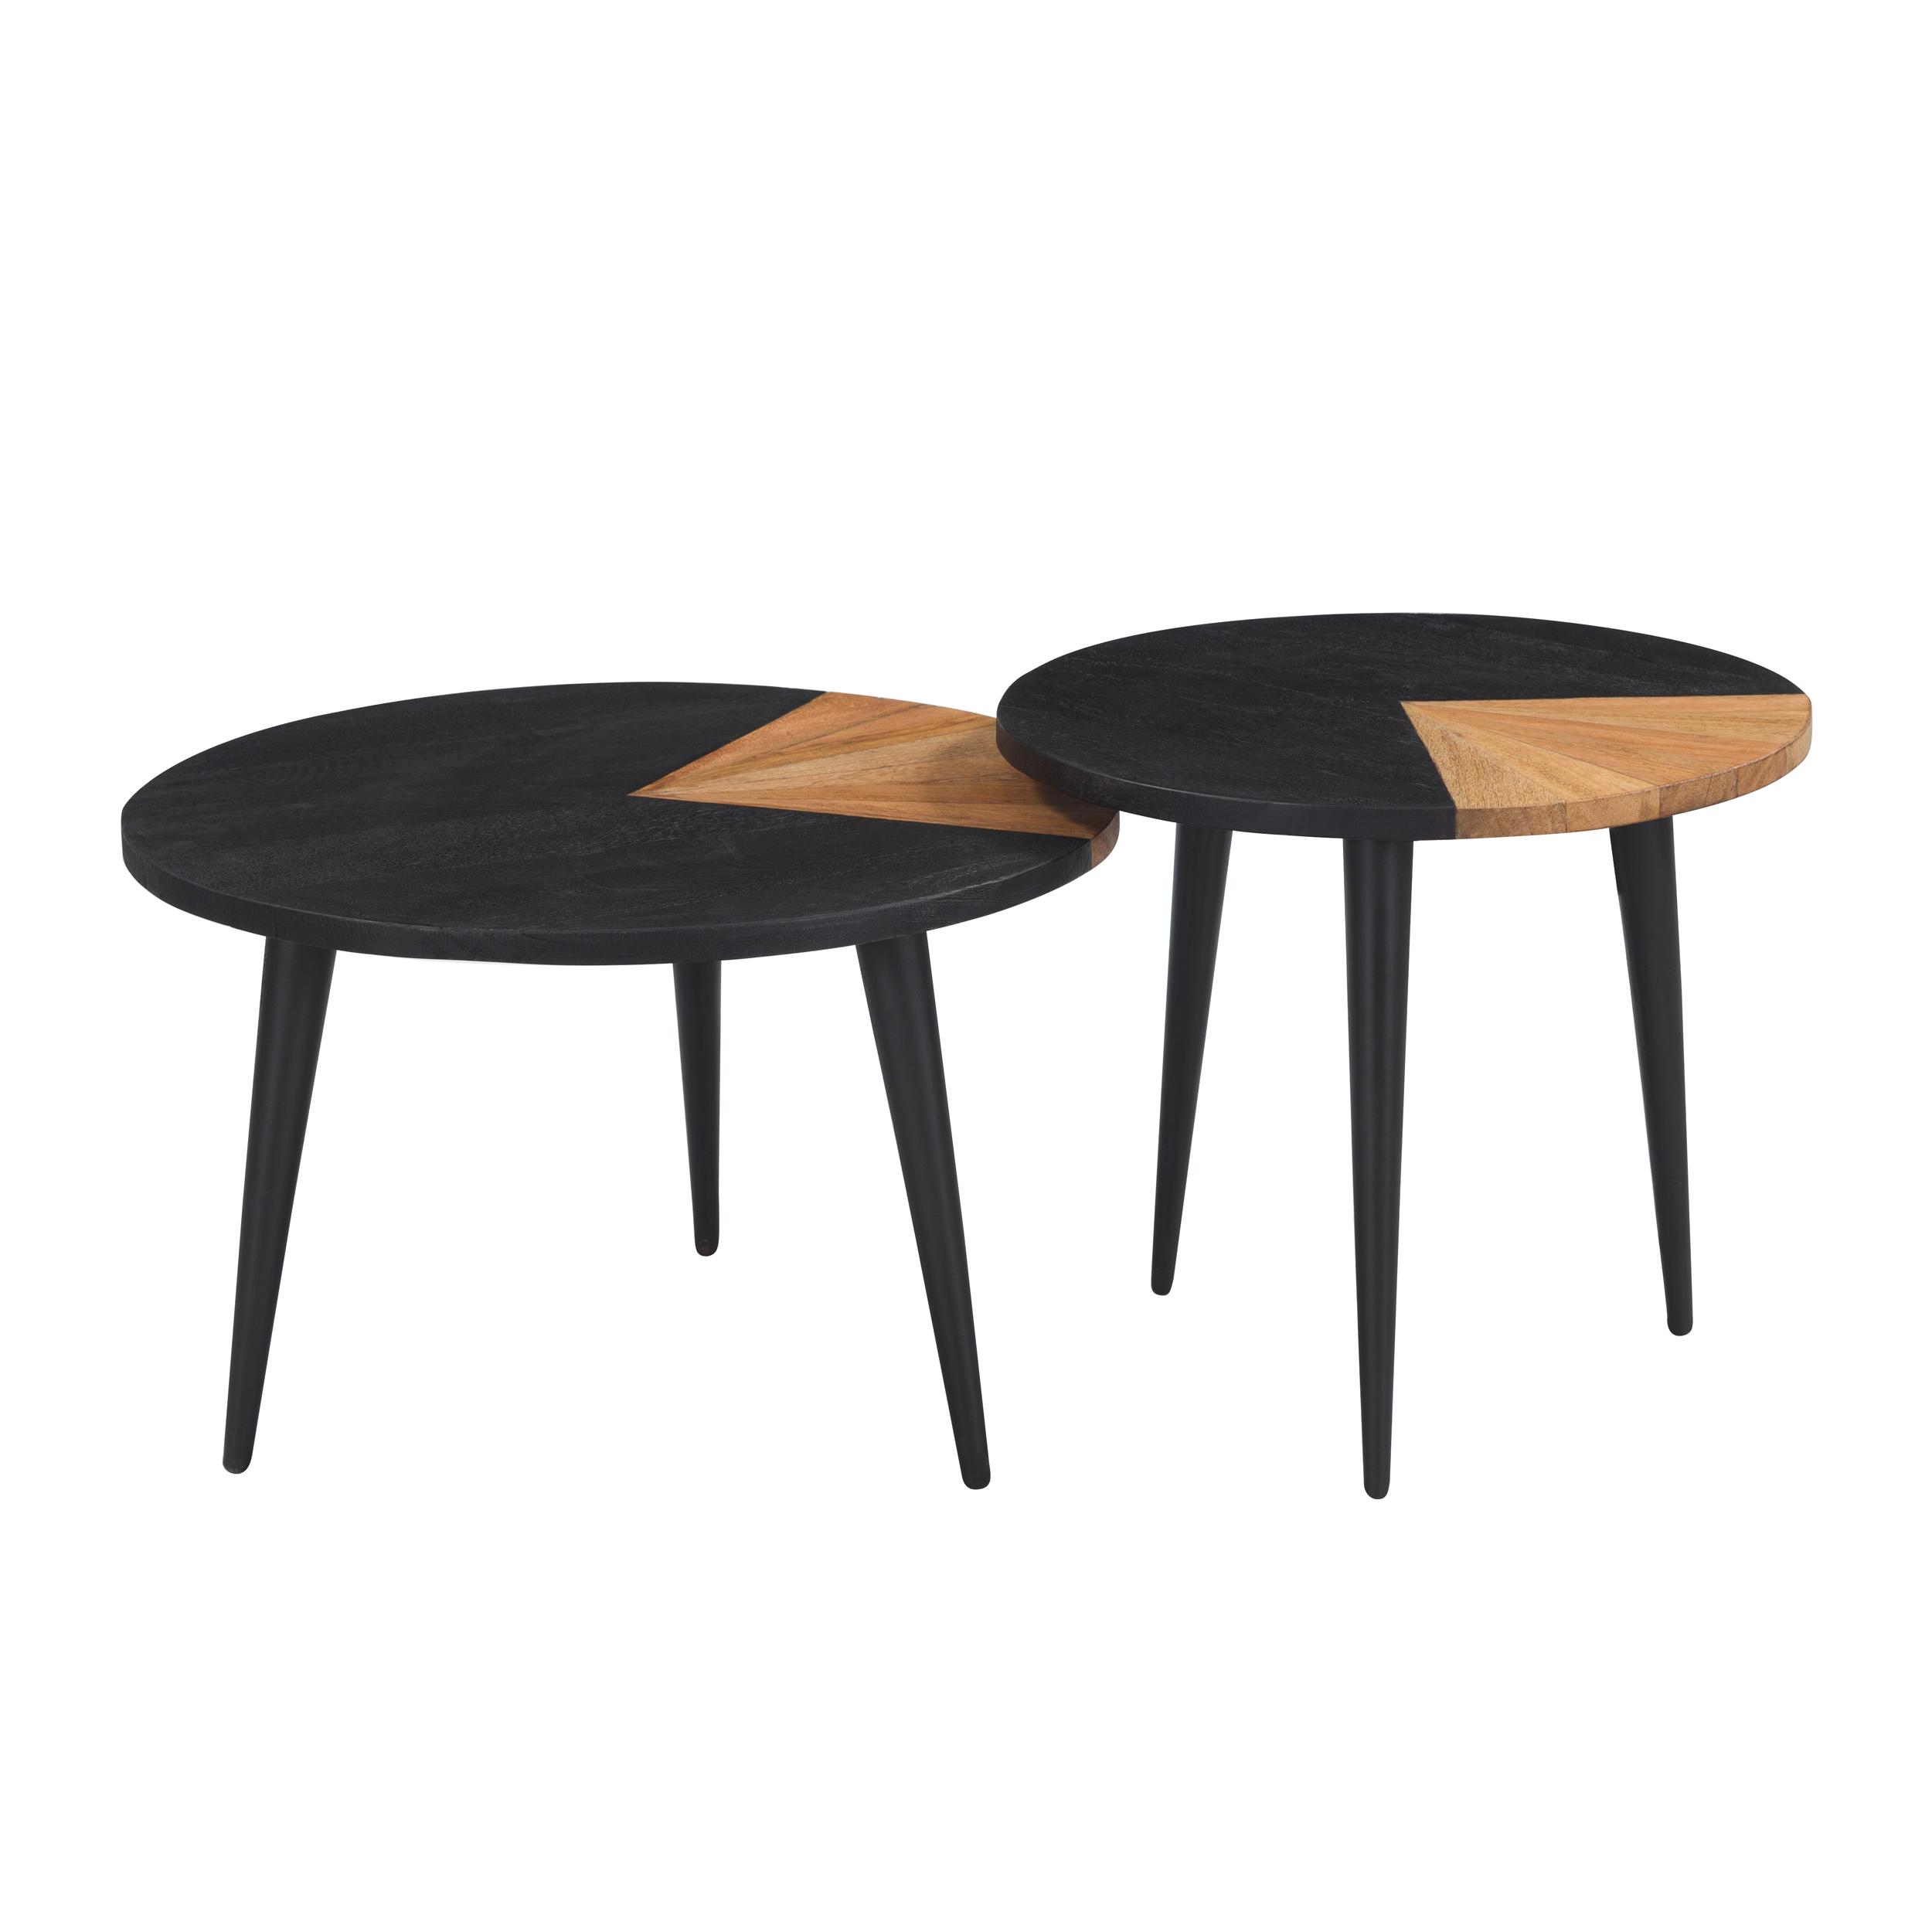 Set de 2 tables basses rondes en bois d'acacia